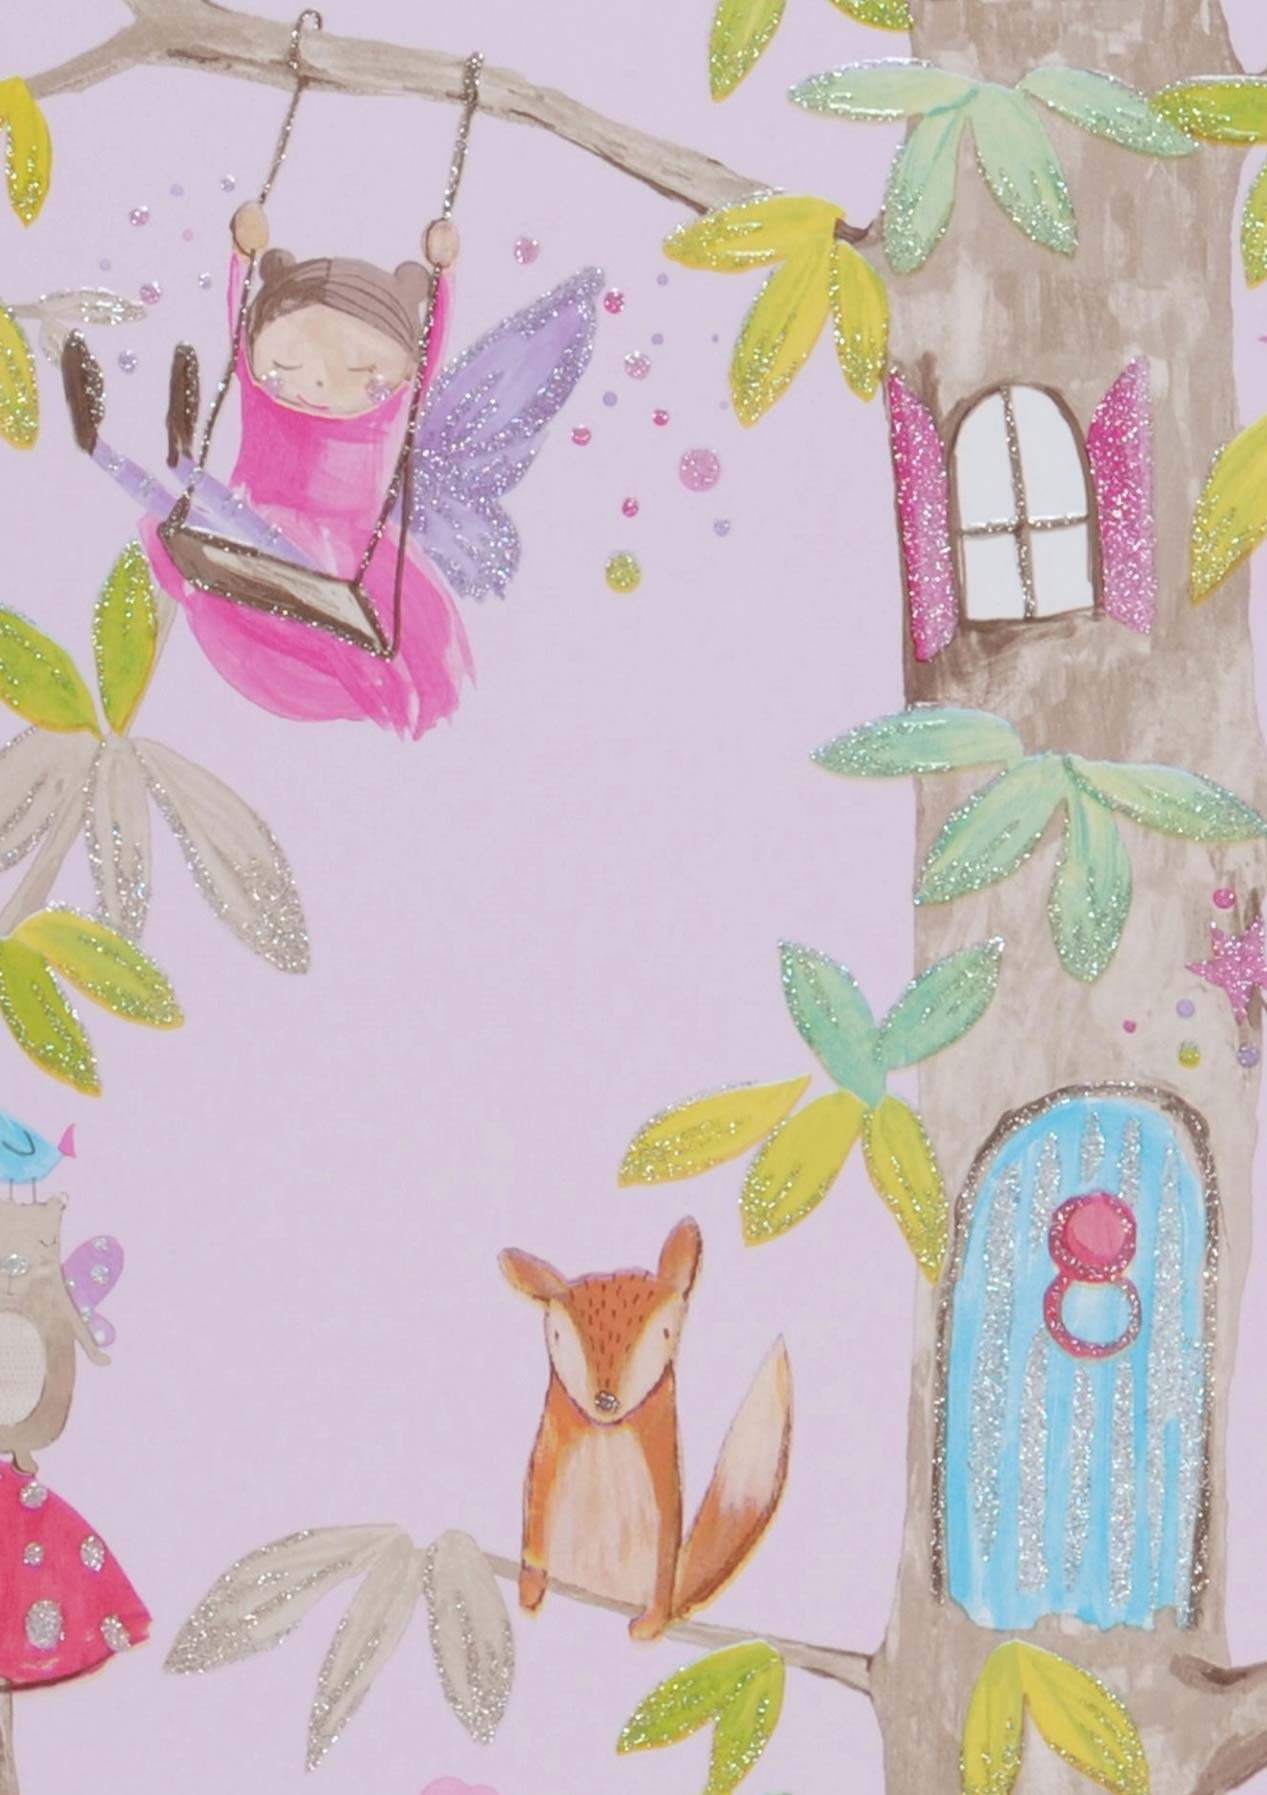 tapete ebbelie blassviolett gr ngelb glitzer lila glitzer pink t rkisblau glitzer. Black Bedroom Furniture Sets. Home Design Ideas